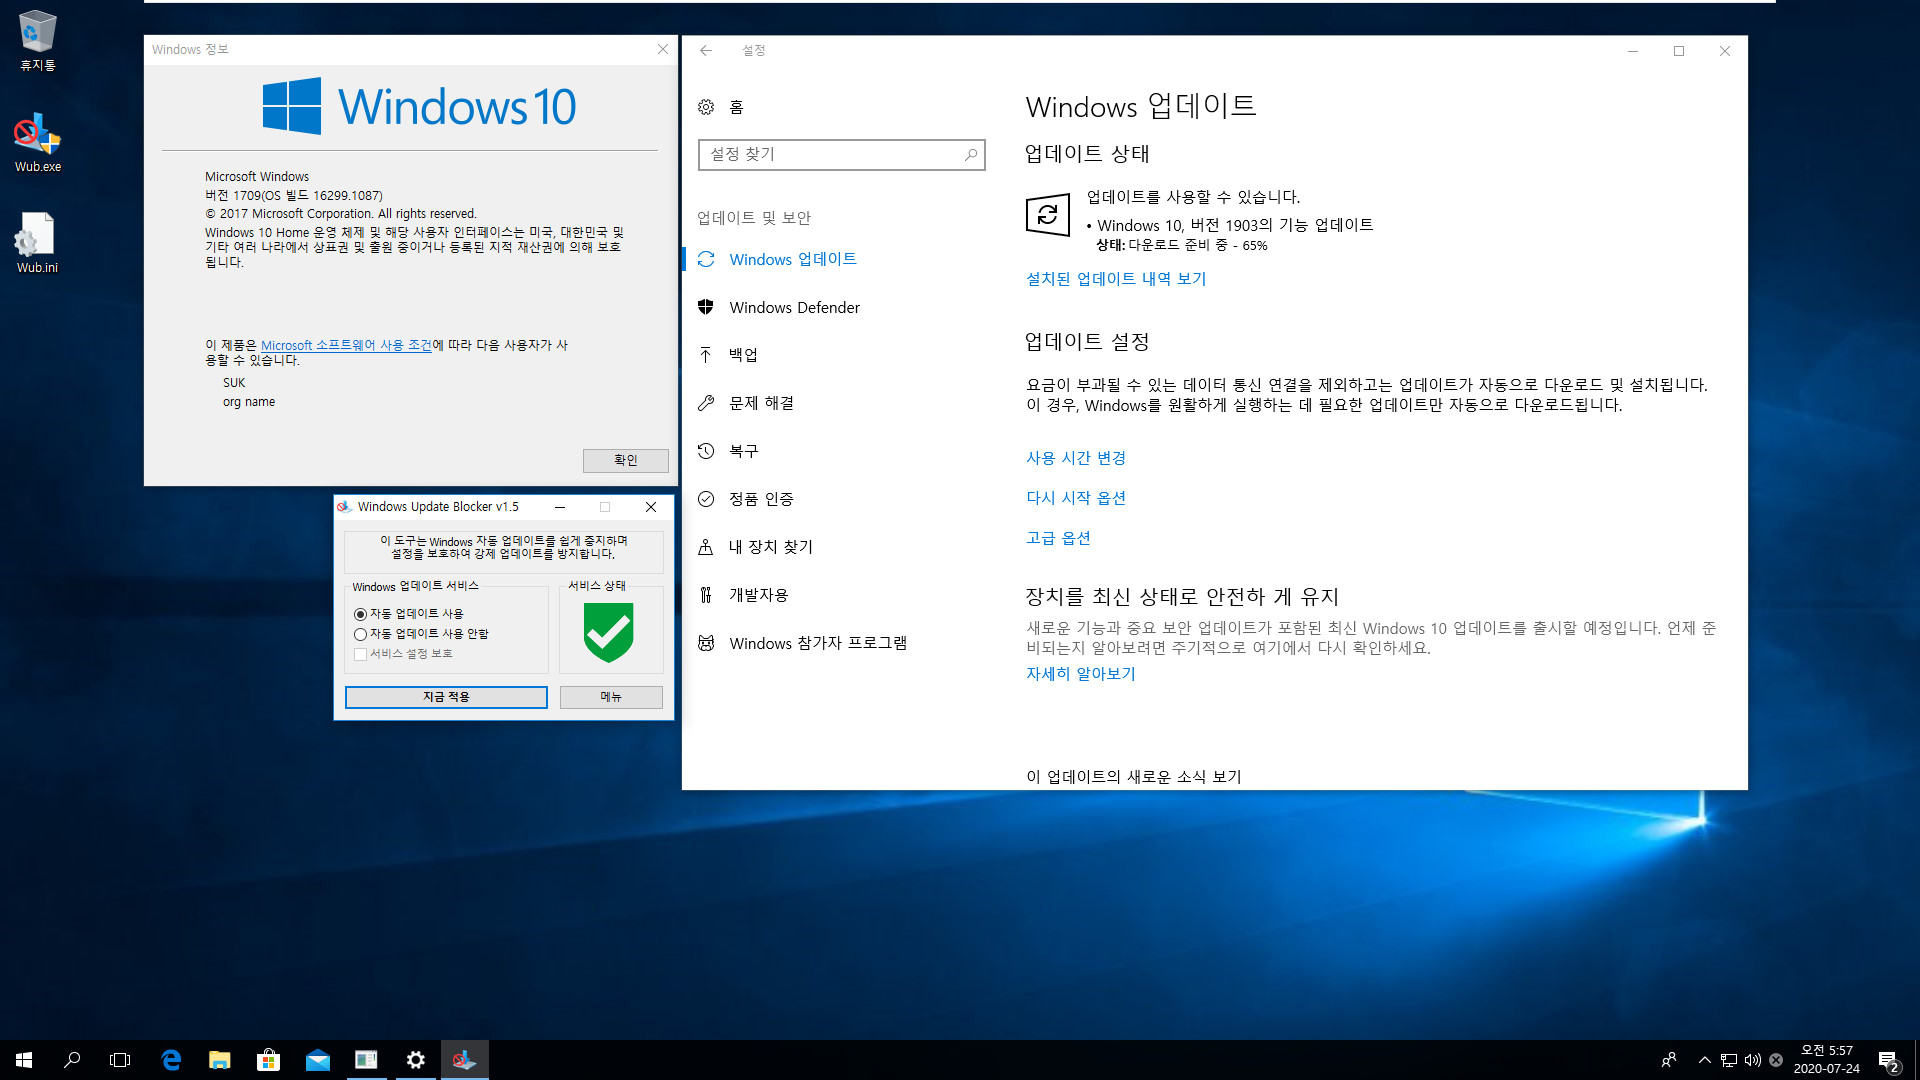 Windows Update Blocker v1.5 업데이트 방지 테스트 - 윈도우는 버전 1709으로 현재 강제 업데이트 중인 버전이고 홈 에디션 - 테스트 시작 2020-07-24_055737.jpg